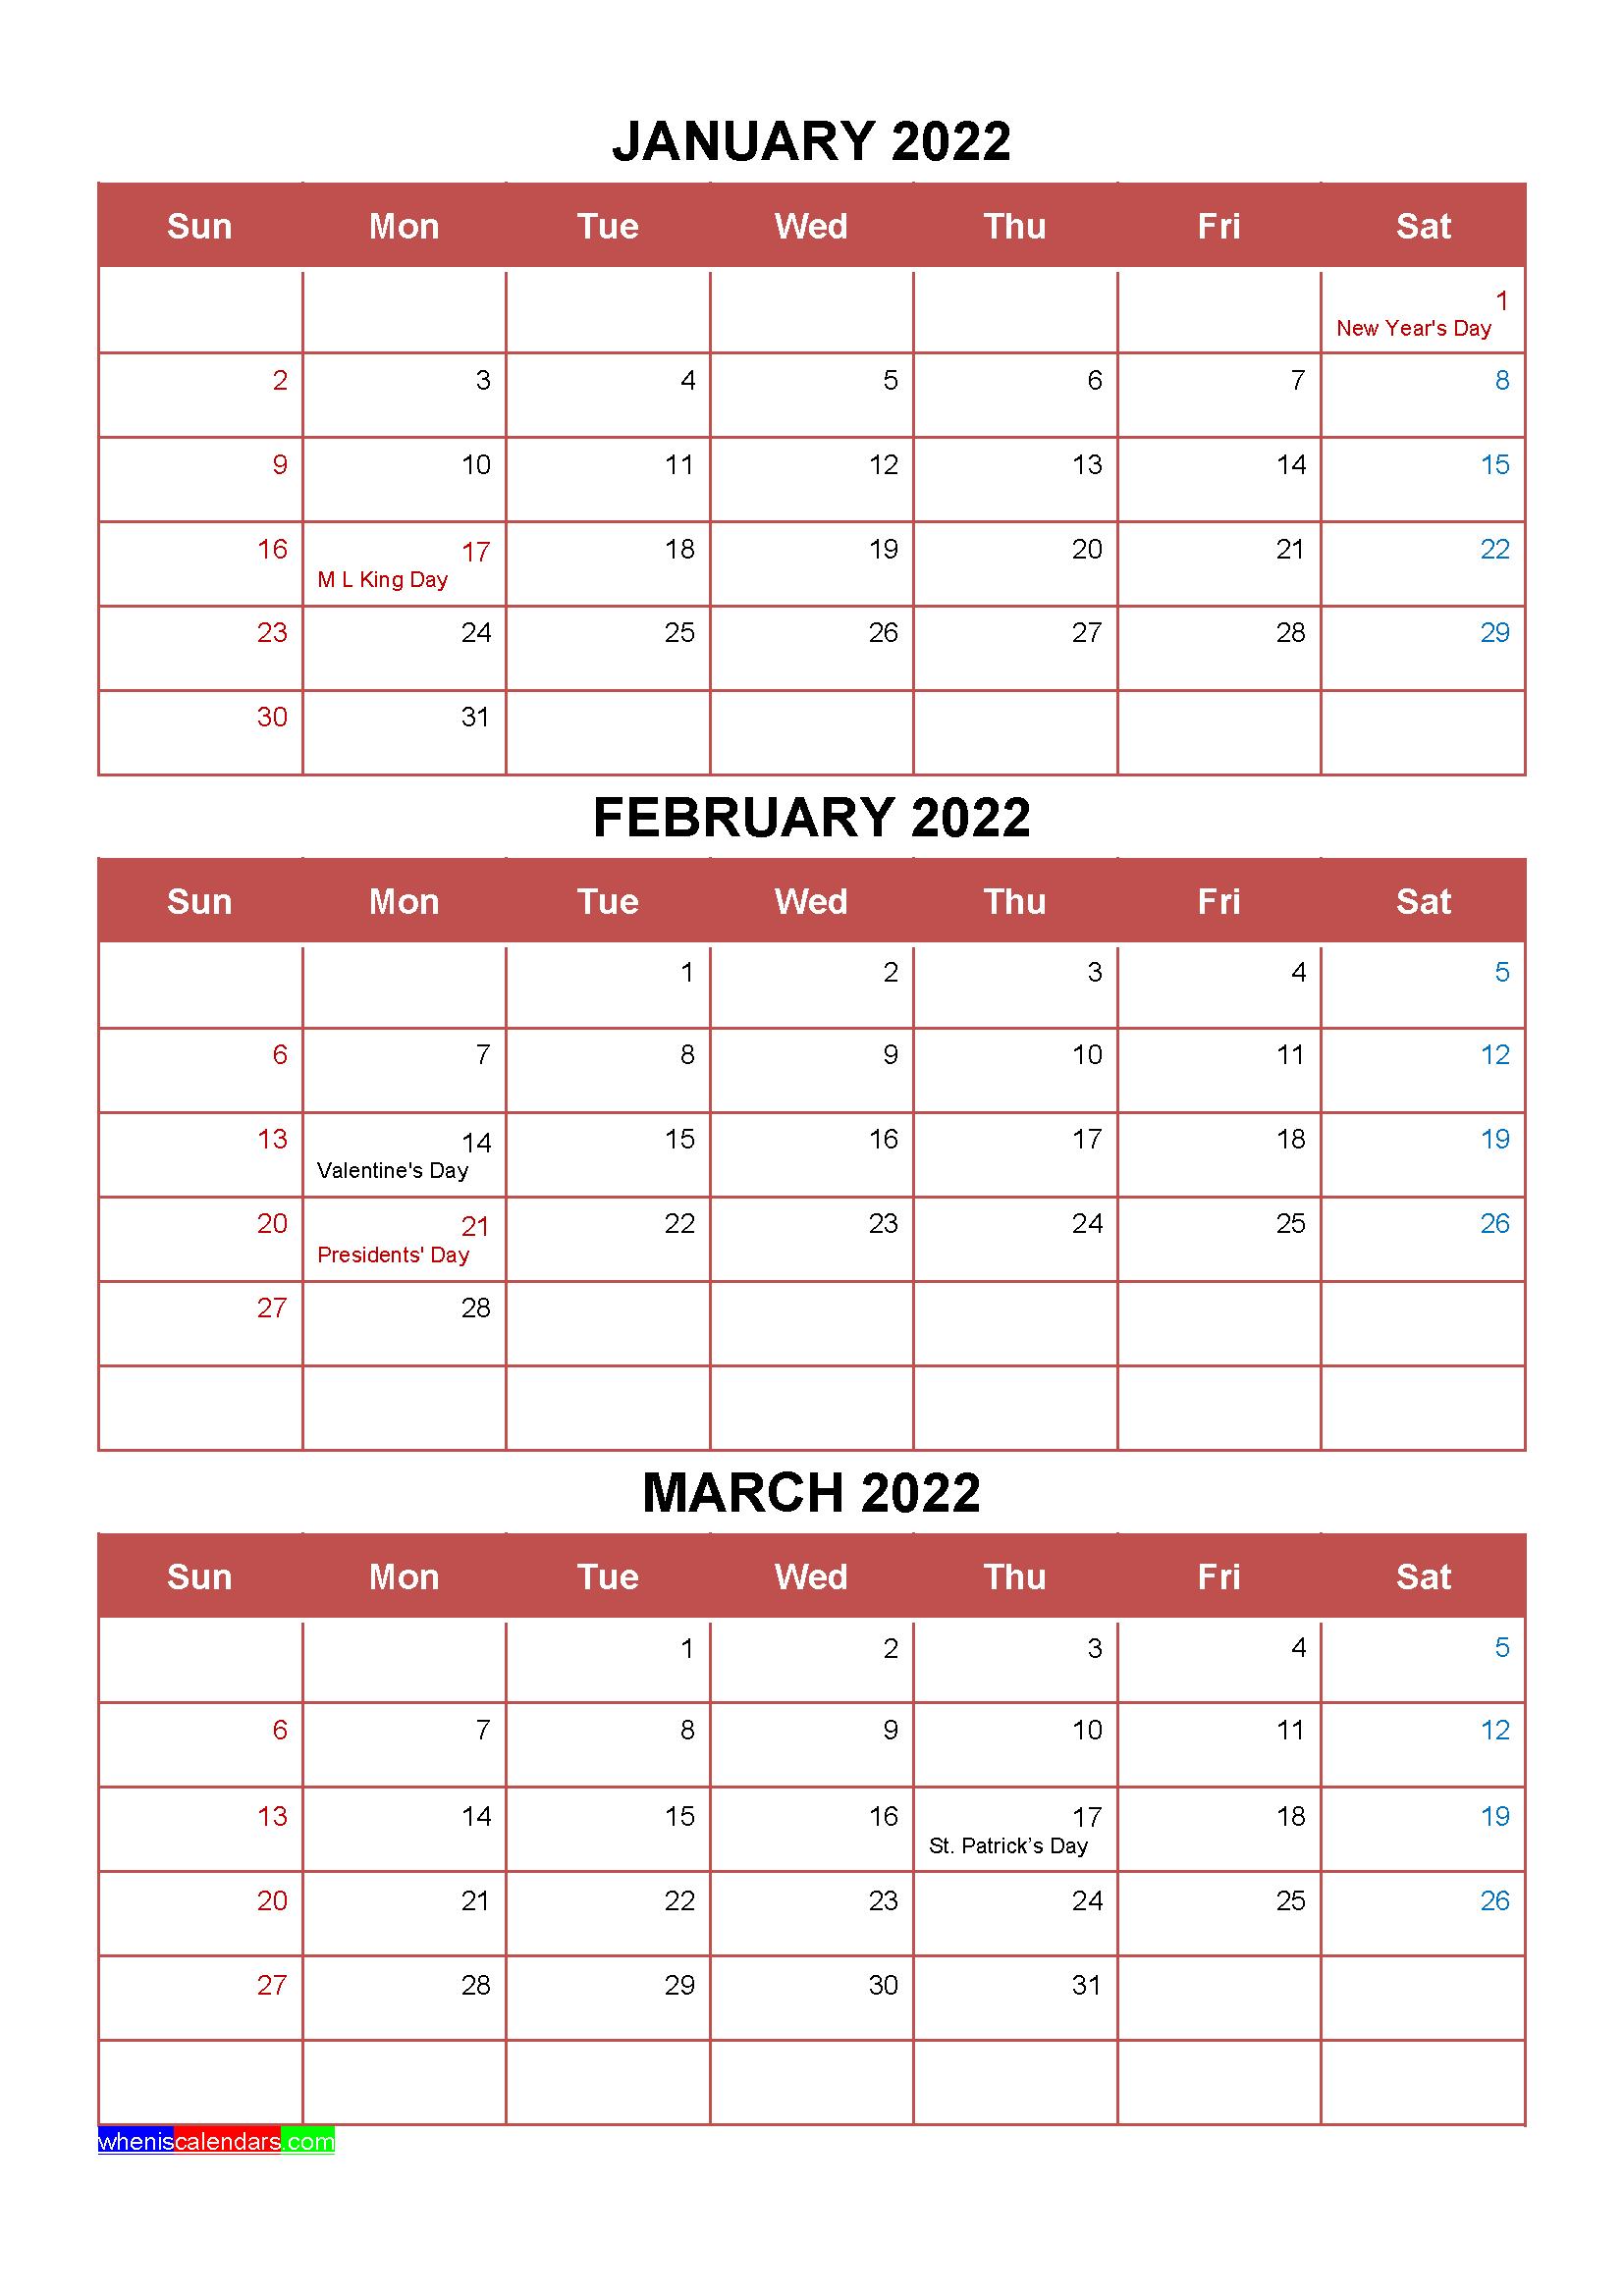 January February March 2022 Calendar.Free January February March 2022 Calendar With Holidays Four Quarters Calendar Printables Free Printable Calendar Templates Calendar Template